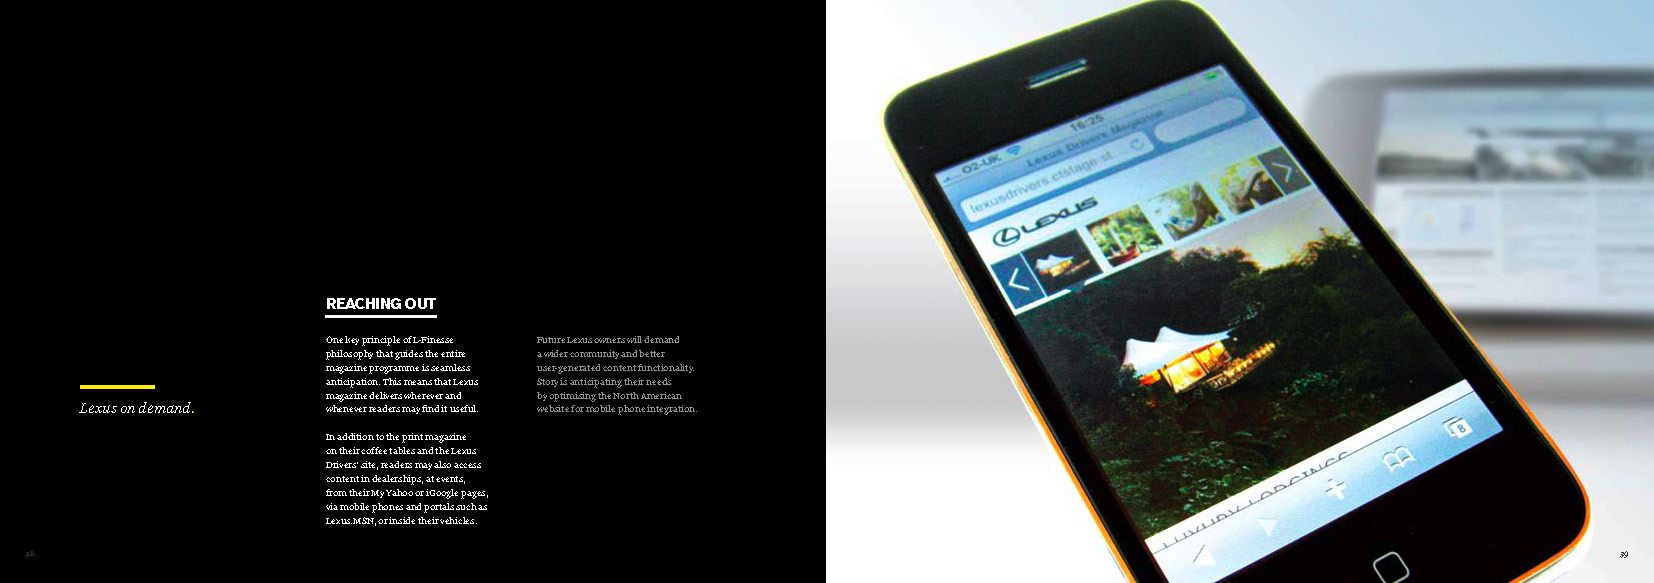 Lexus-case-study-Story-mobile